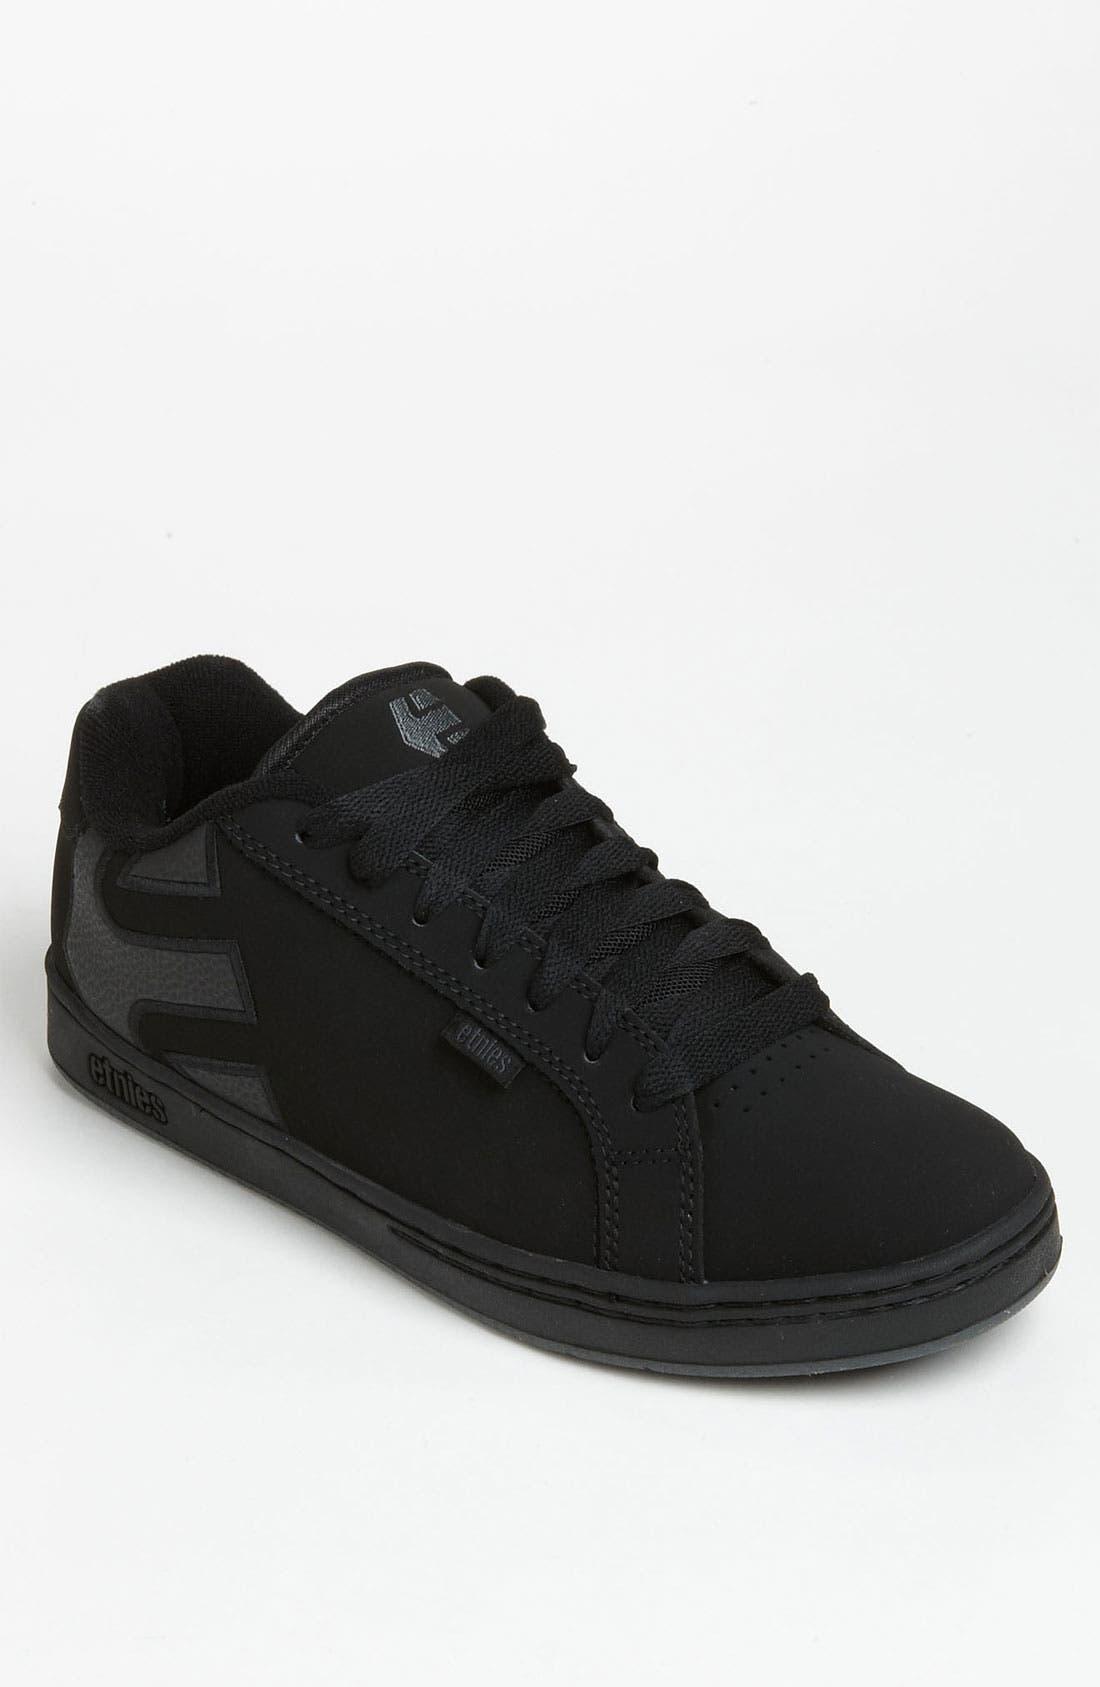 Alternate Image 1 Selected - Etnies 'Fader' Skate Shoe (Men)